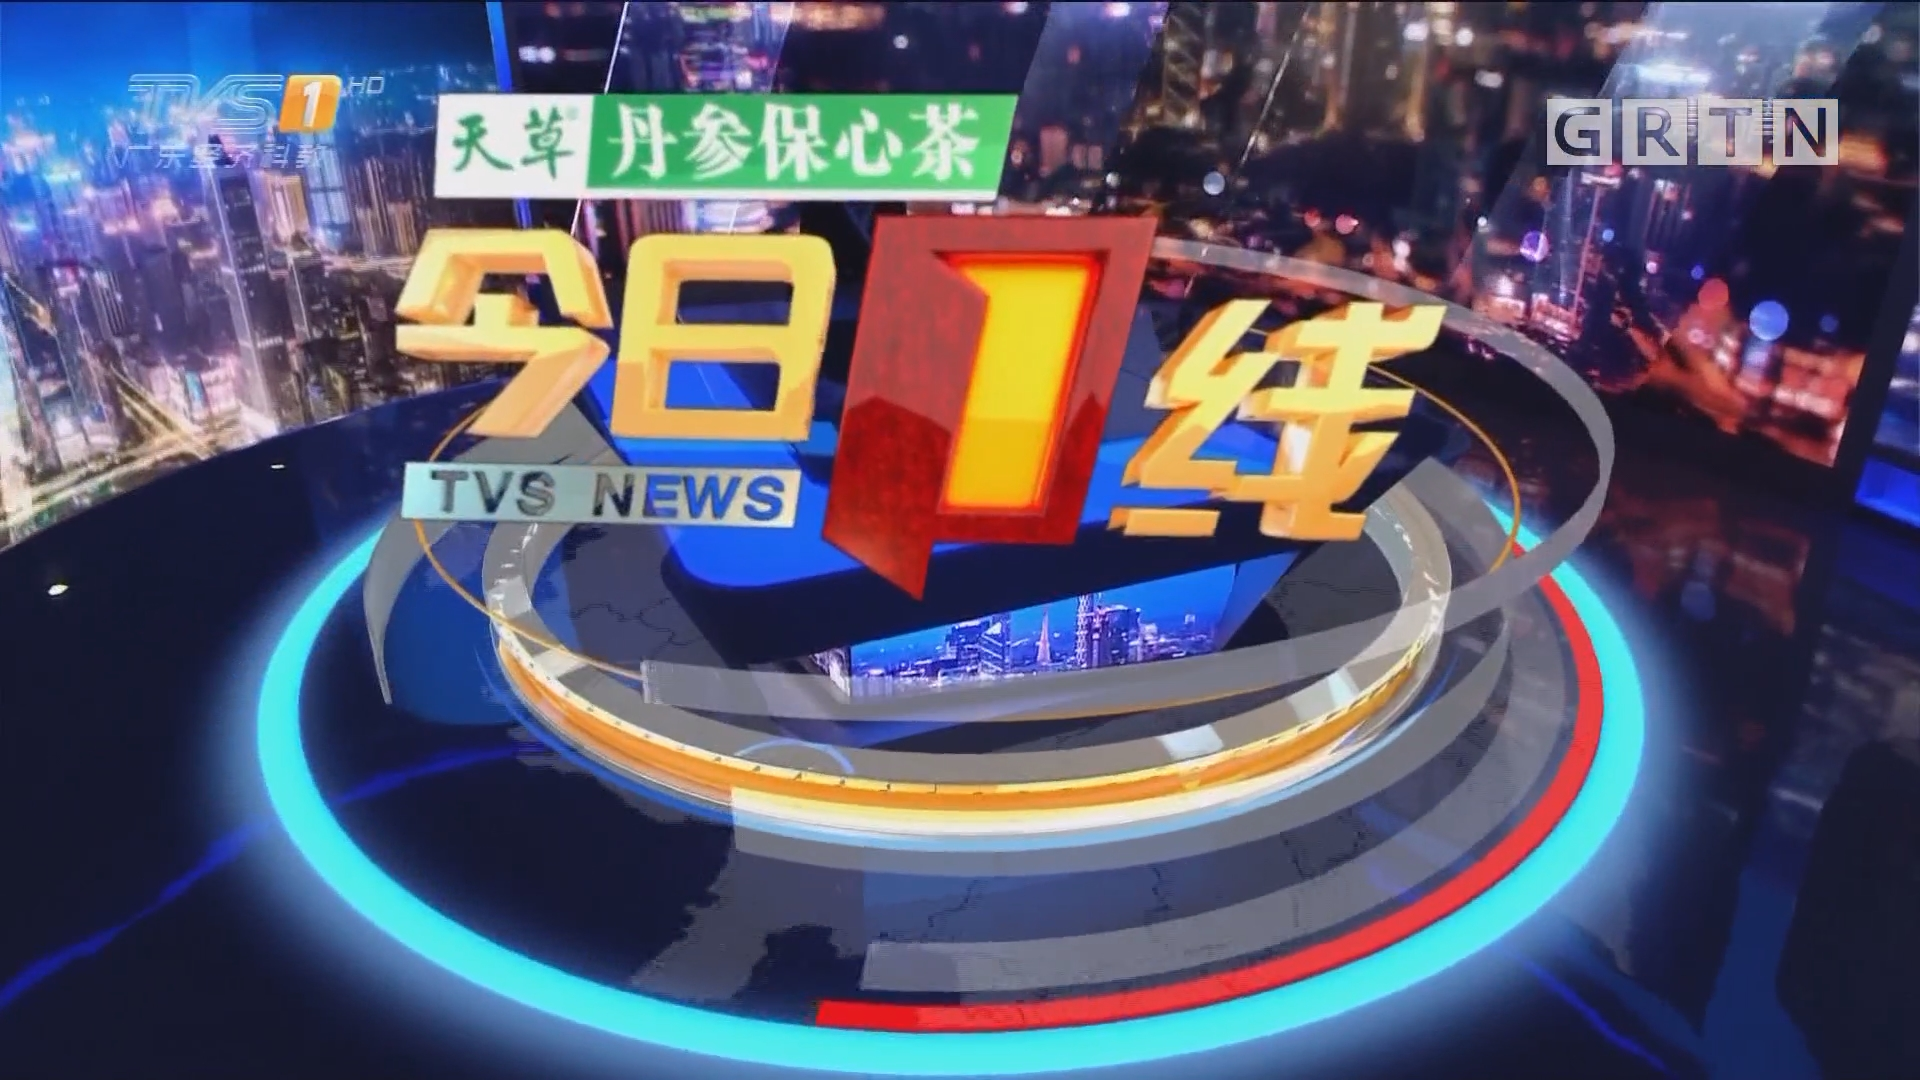 [HD][2019-03-26]今日一线:阳江海陵岛:四游人失足坠海两天 搜救仍在继续